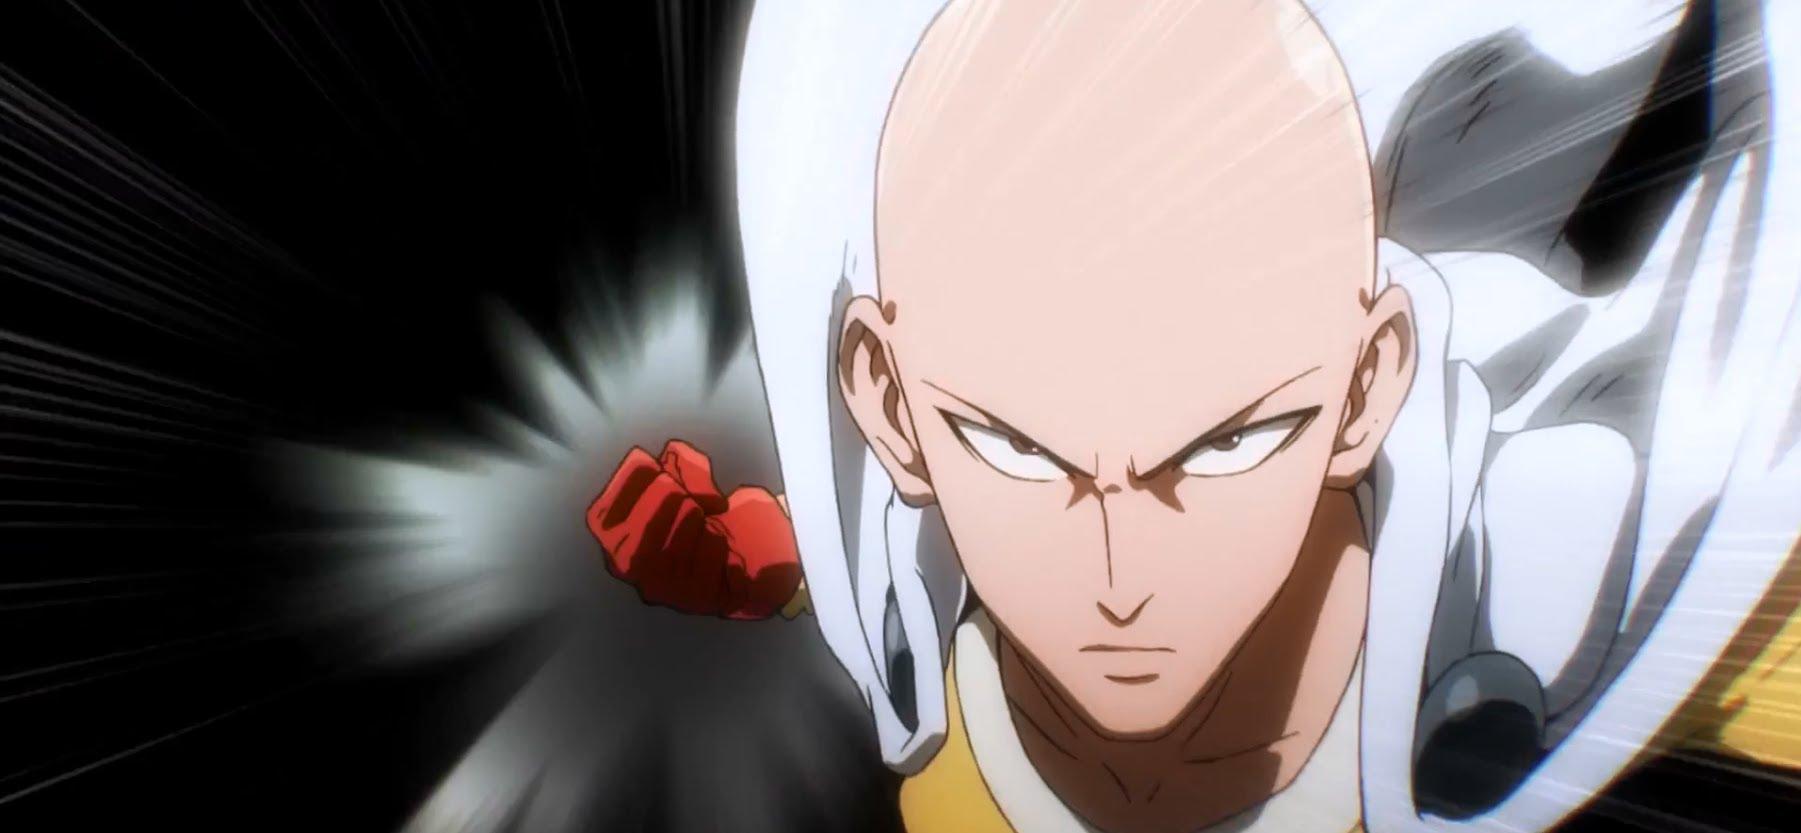 One Punch Man season 2 news and date – Saitama will be back!